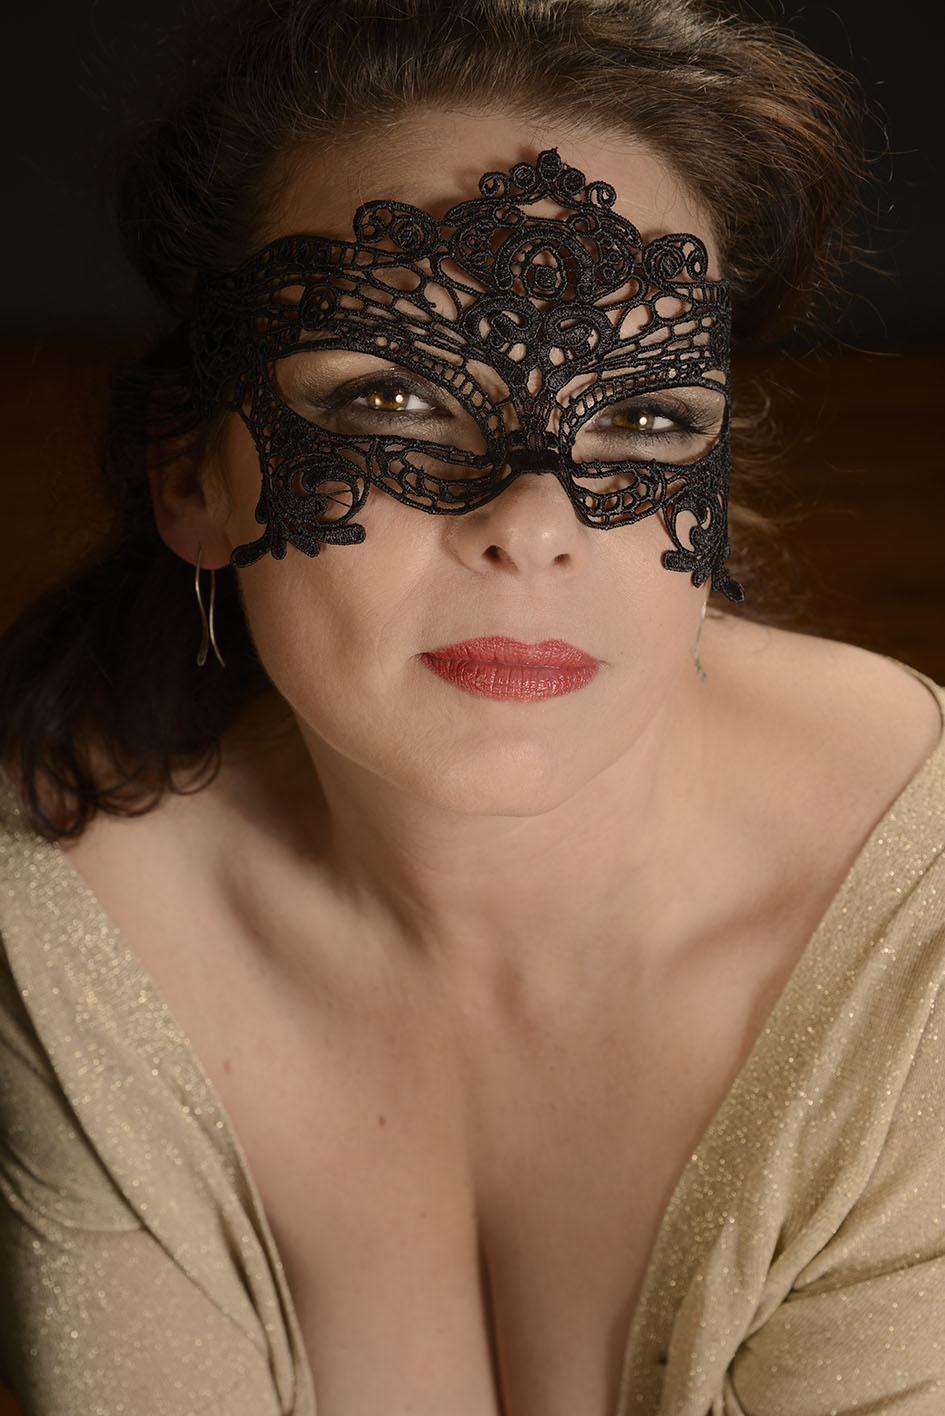 boudoir, gemaskerde vrouw